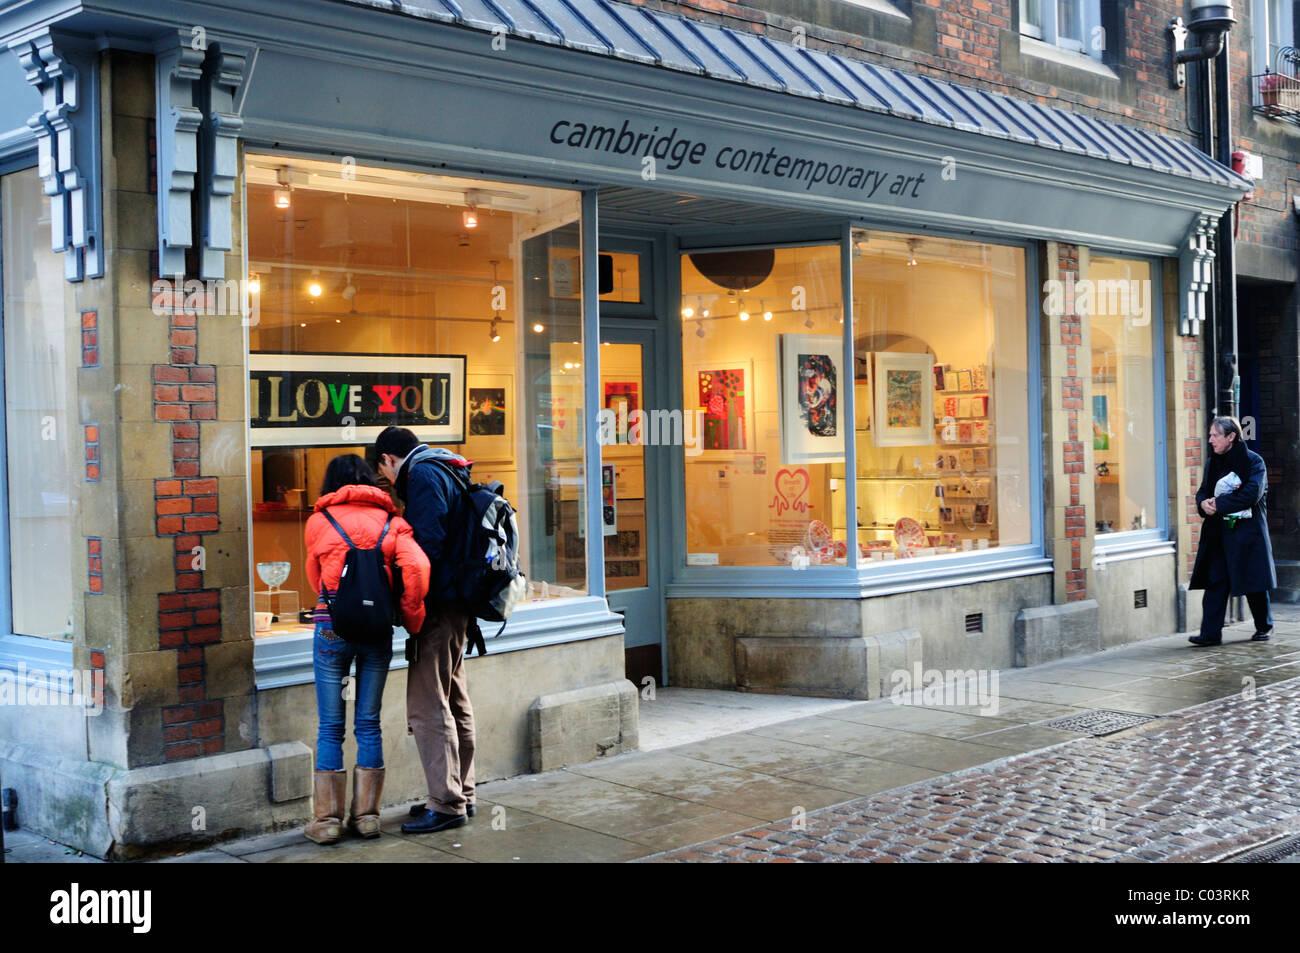 A Couple looking in Cambridge Contemporary Art Gallery Window, Trinity Street, Cambridge, England, UK - Stock Image